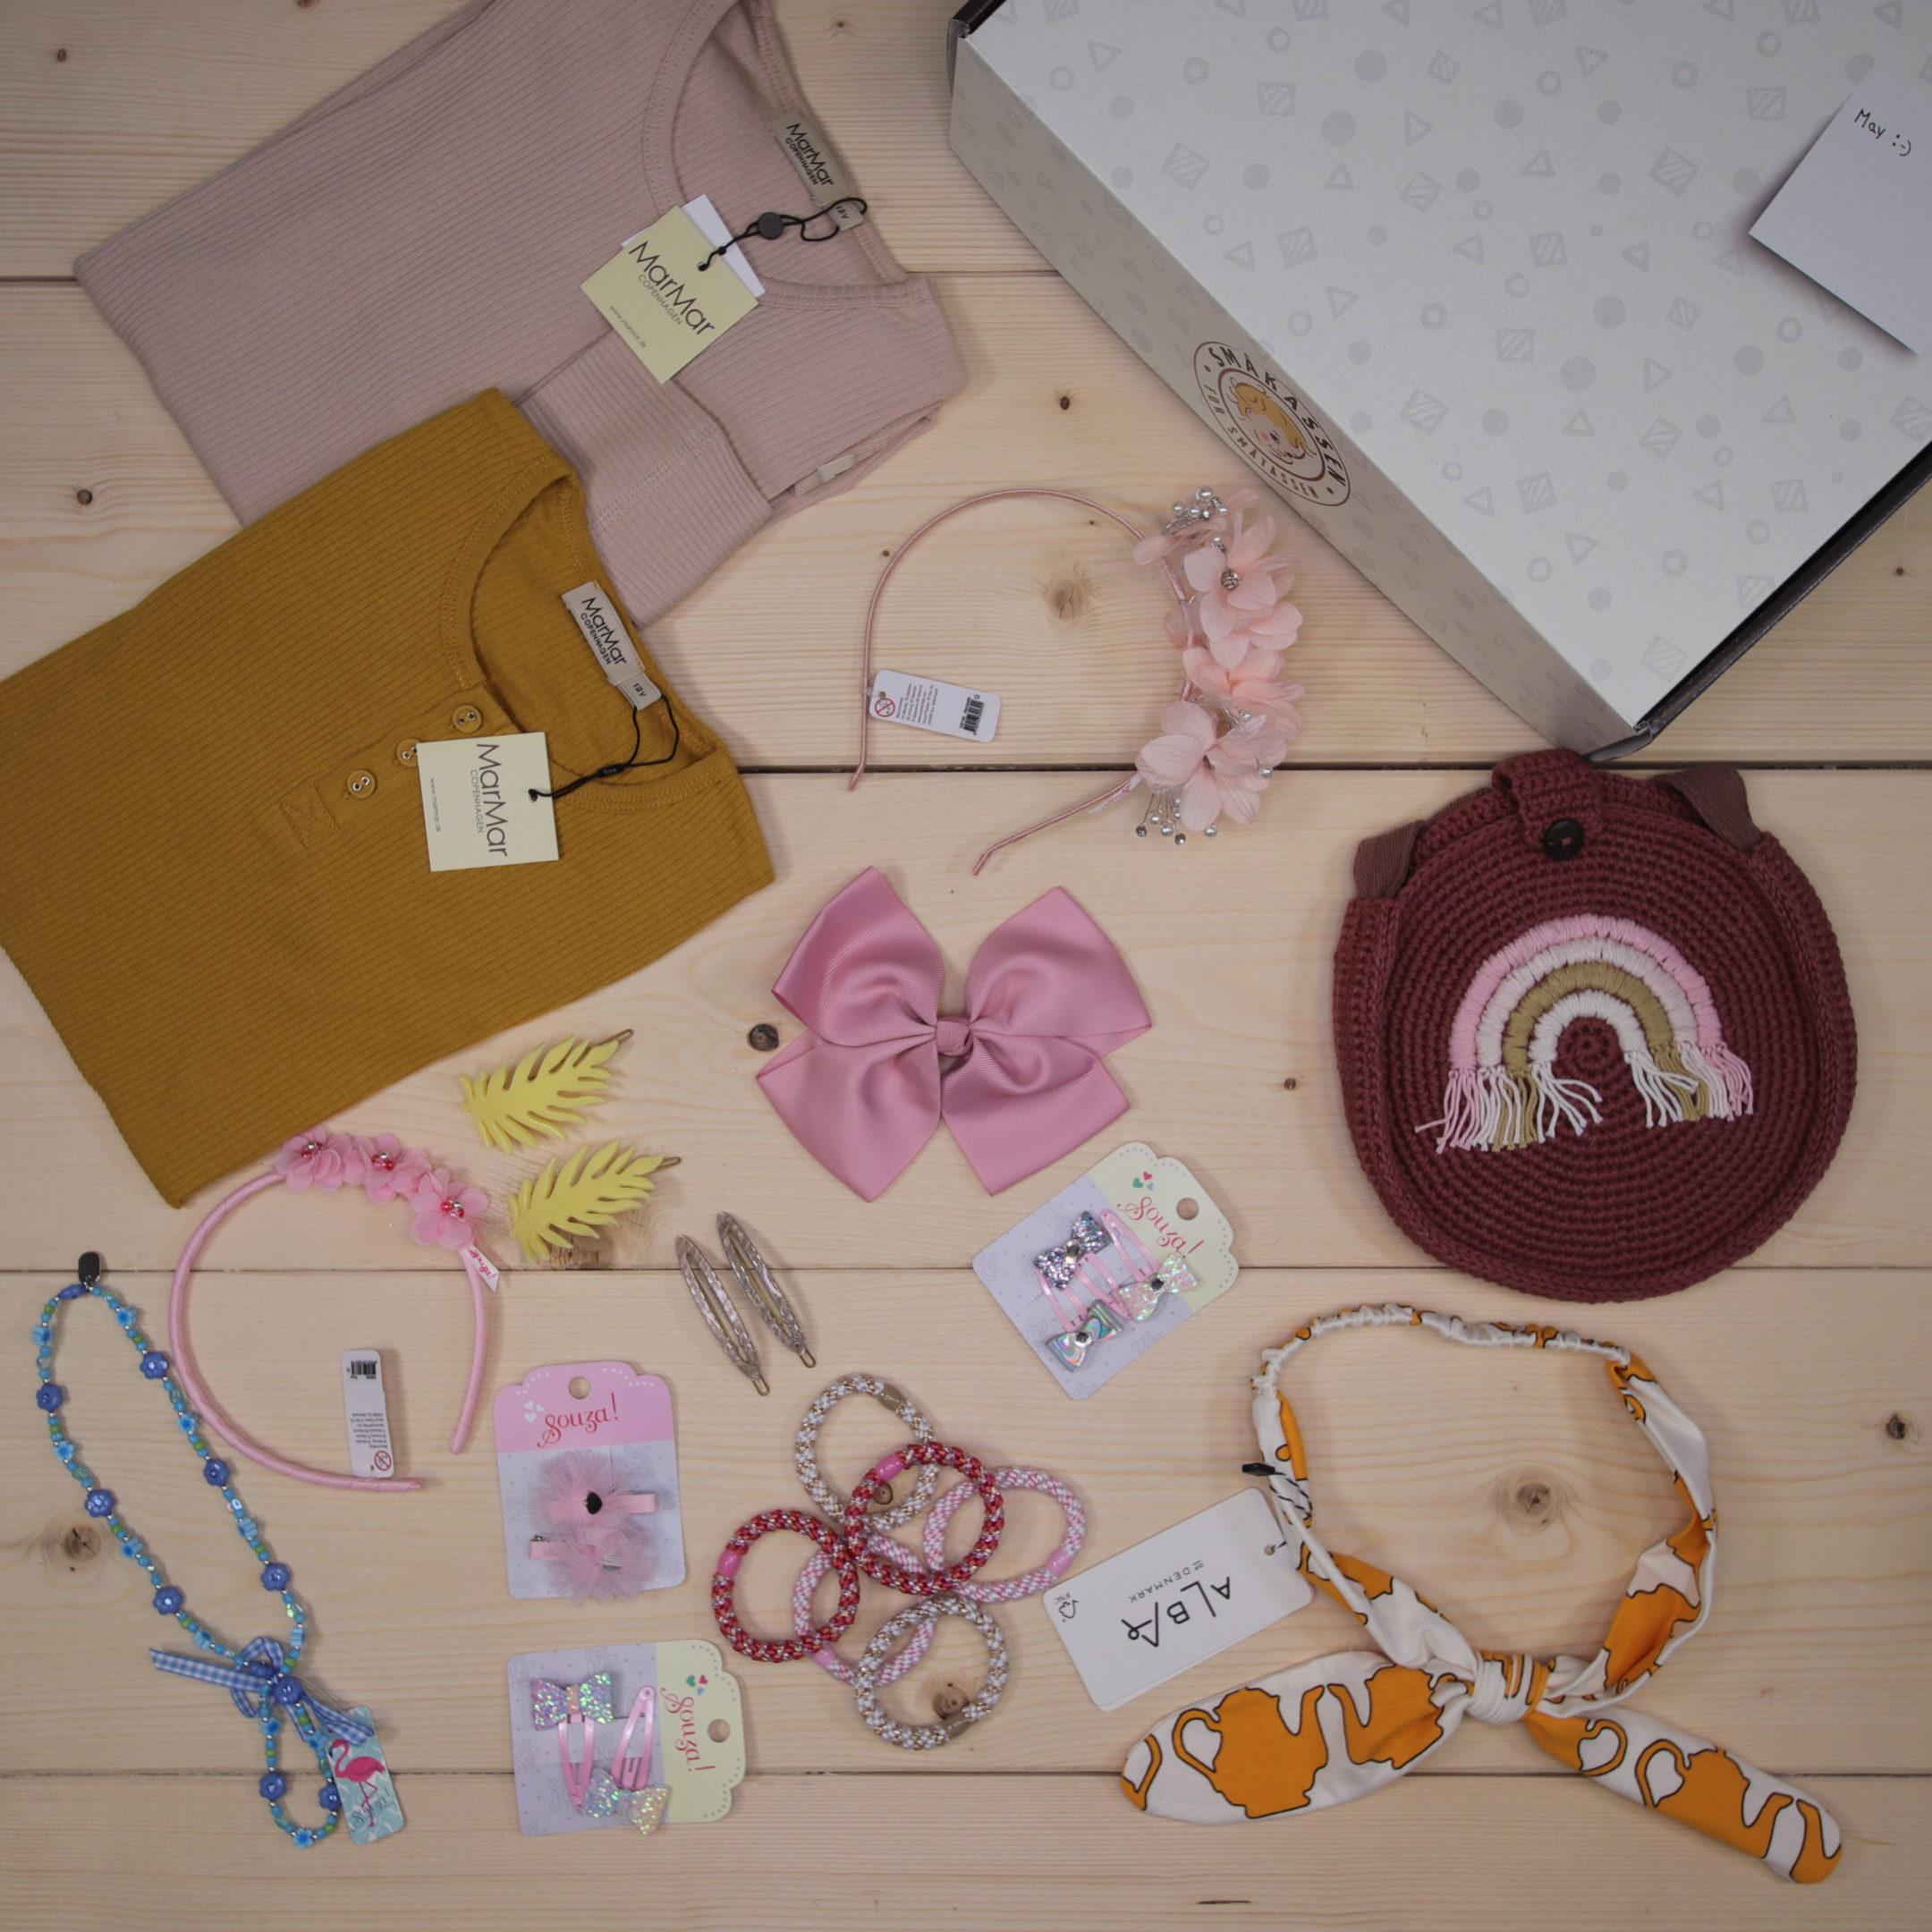 This was a special box for a Småkassen-member in the UK, mostly filled with cute accessories   Dette er Småpakke som vi forberedte for en jente i stilene cute og cool